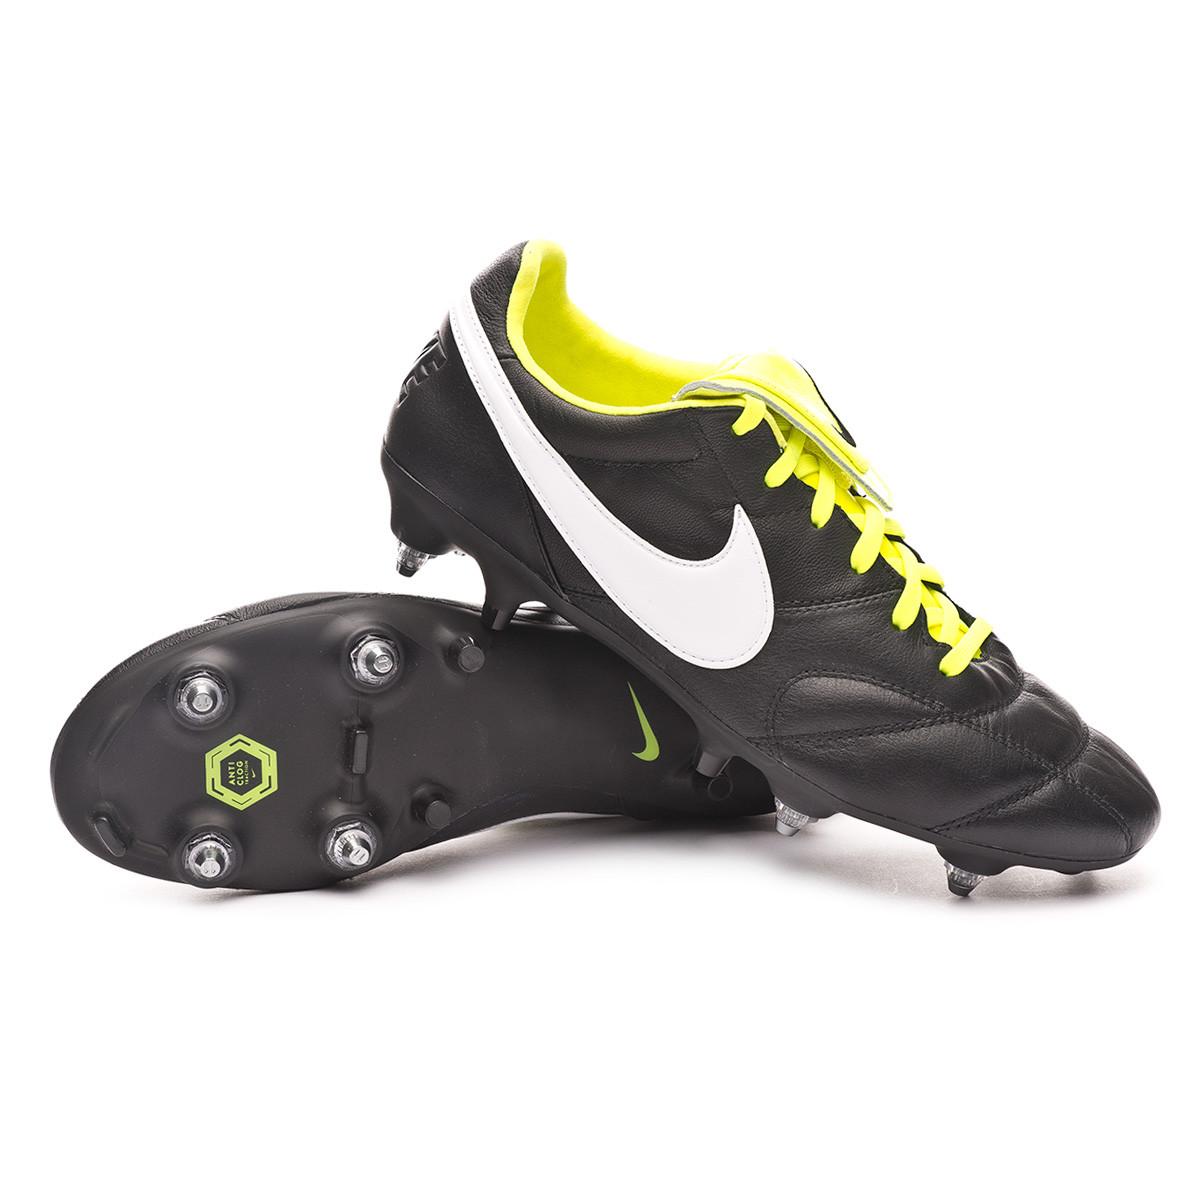 proteger vestir maldición  Football Boots Nike Tiempo Premier II SG-PRO Anti-Clog Traction  Black-White-Volt - Football store Fútbol Emotion